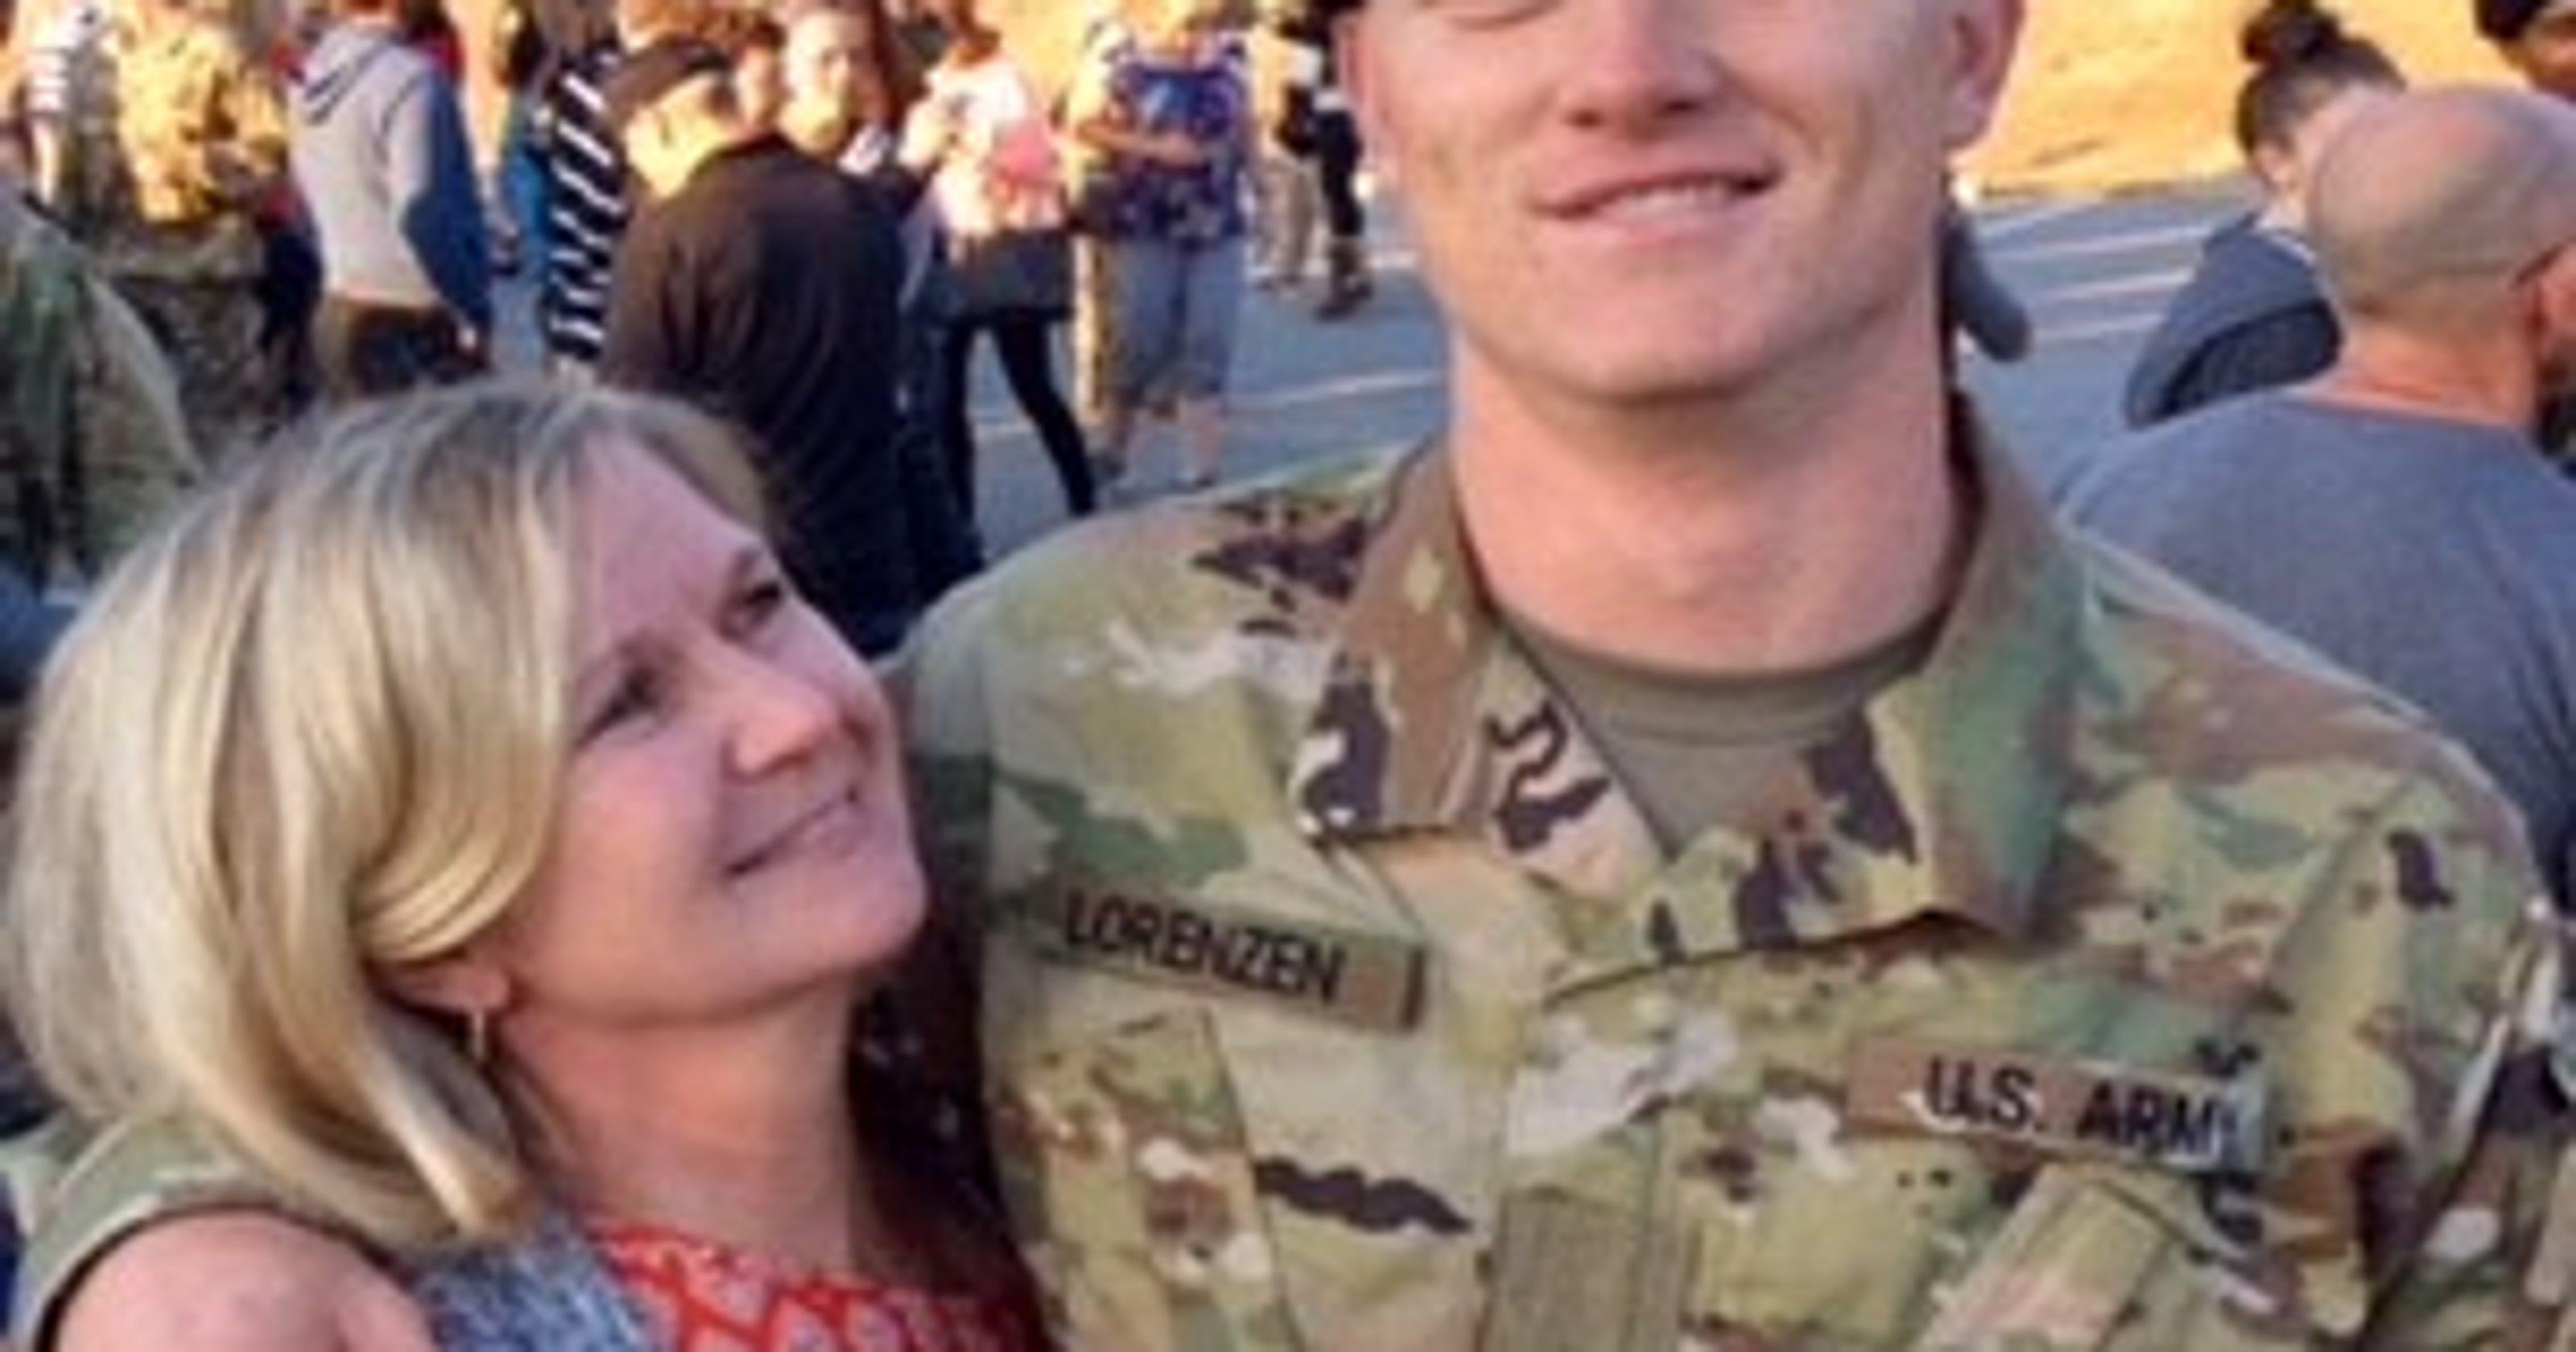 Greenville soldier found dead in his barracks